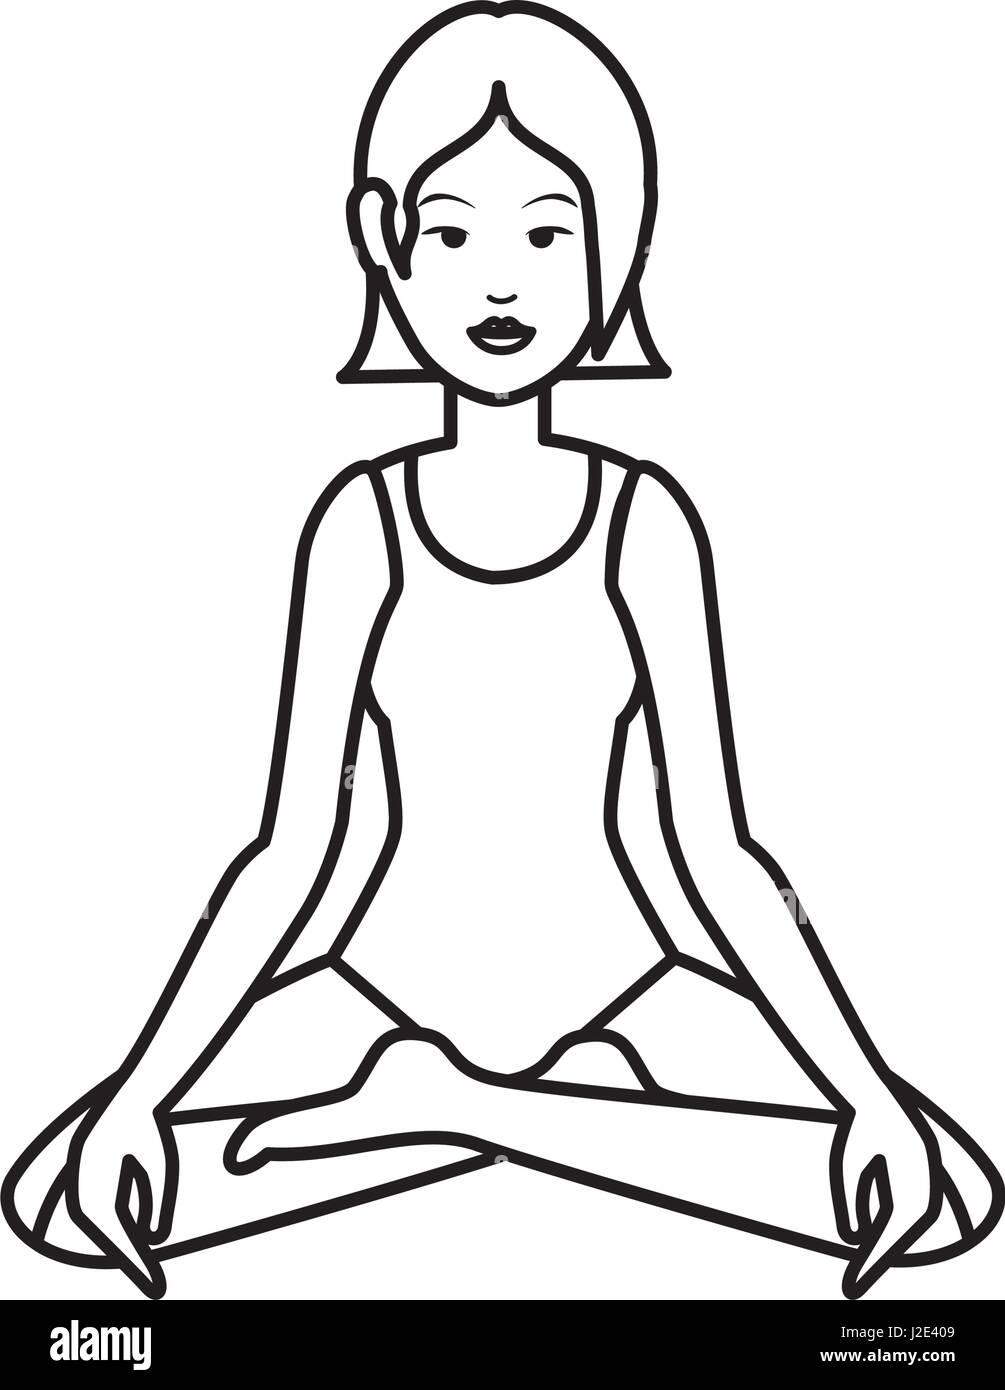 Yoga Cartoon Black And White Stock Photos Images Alamy